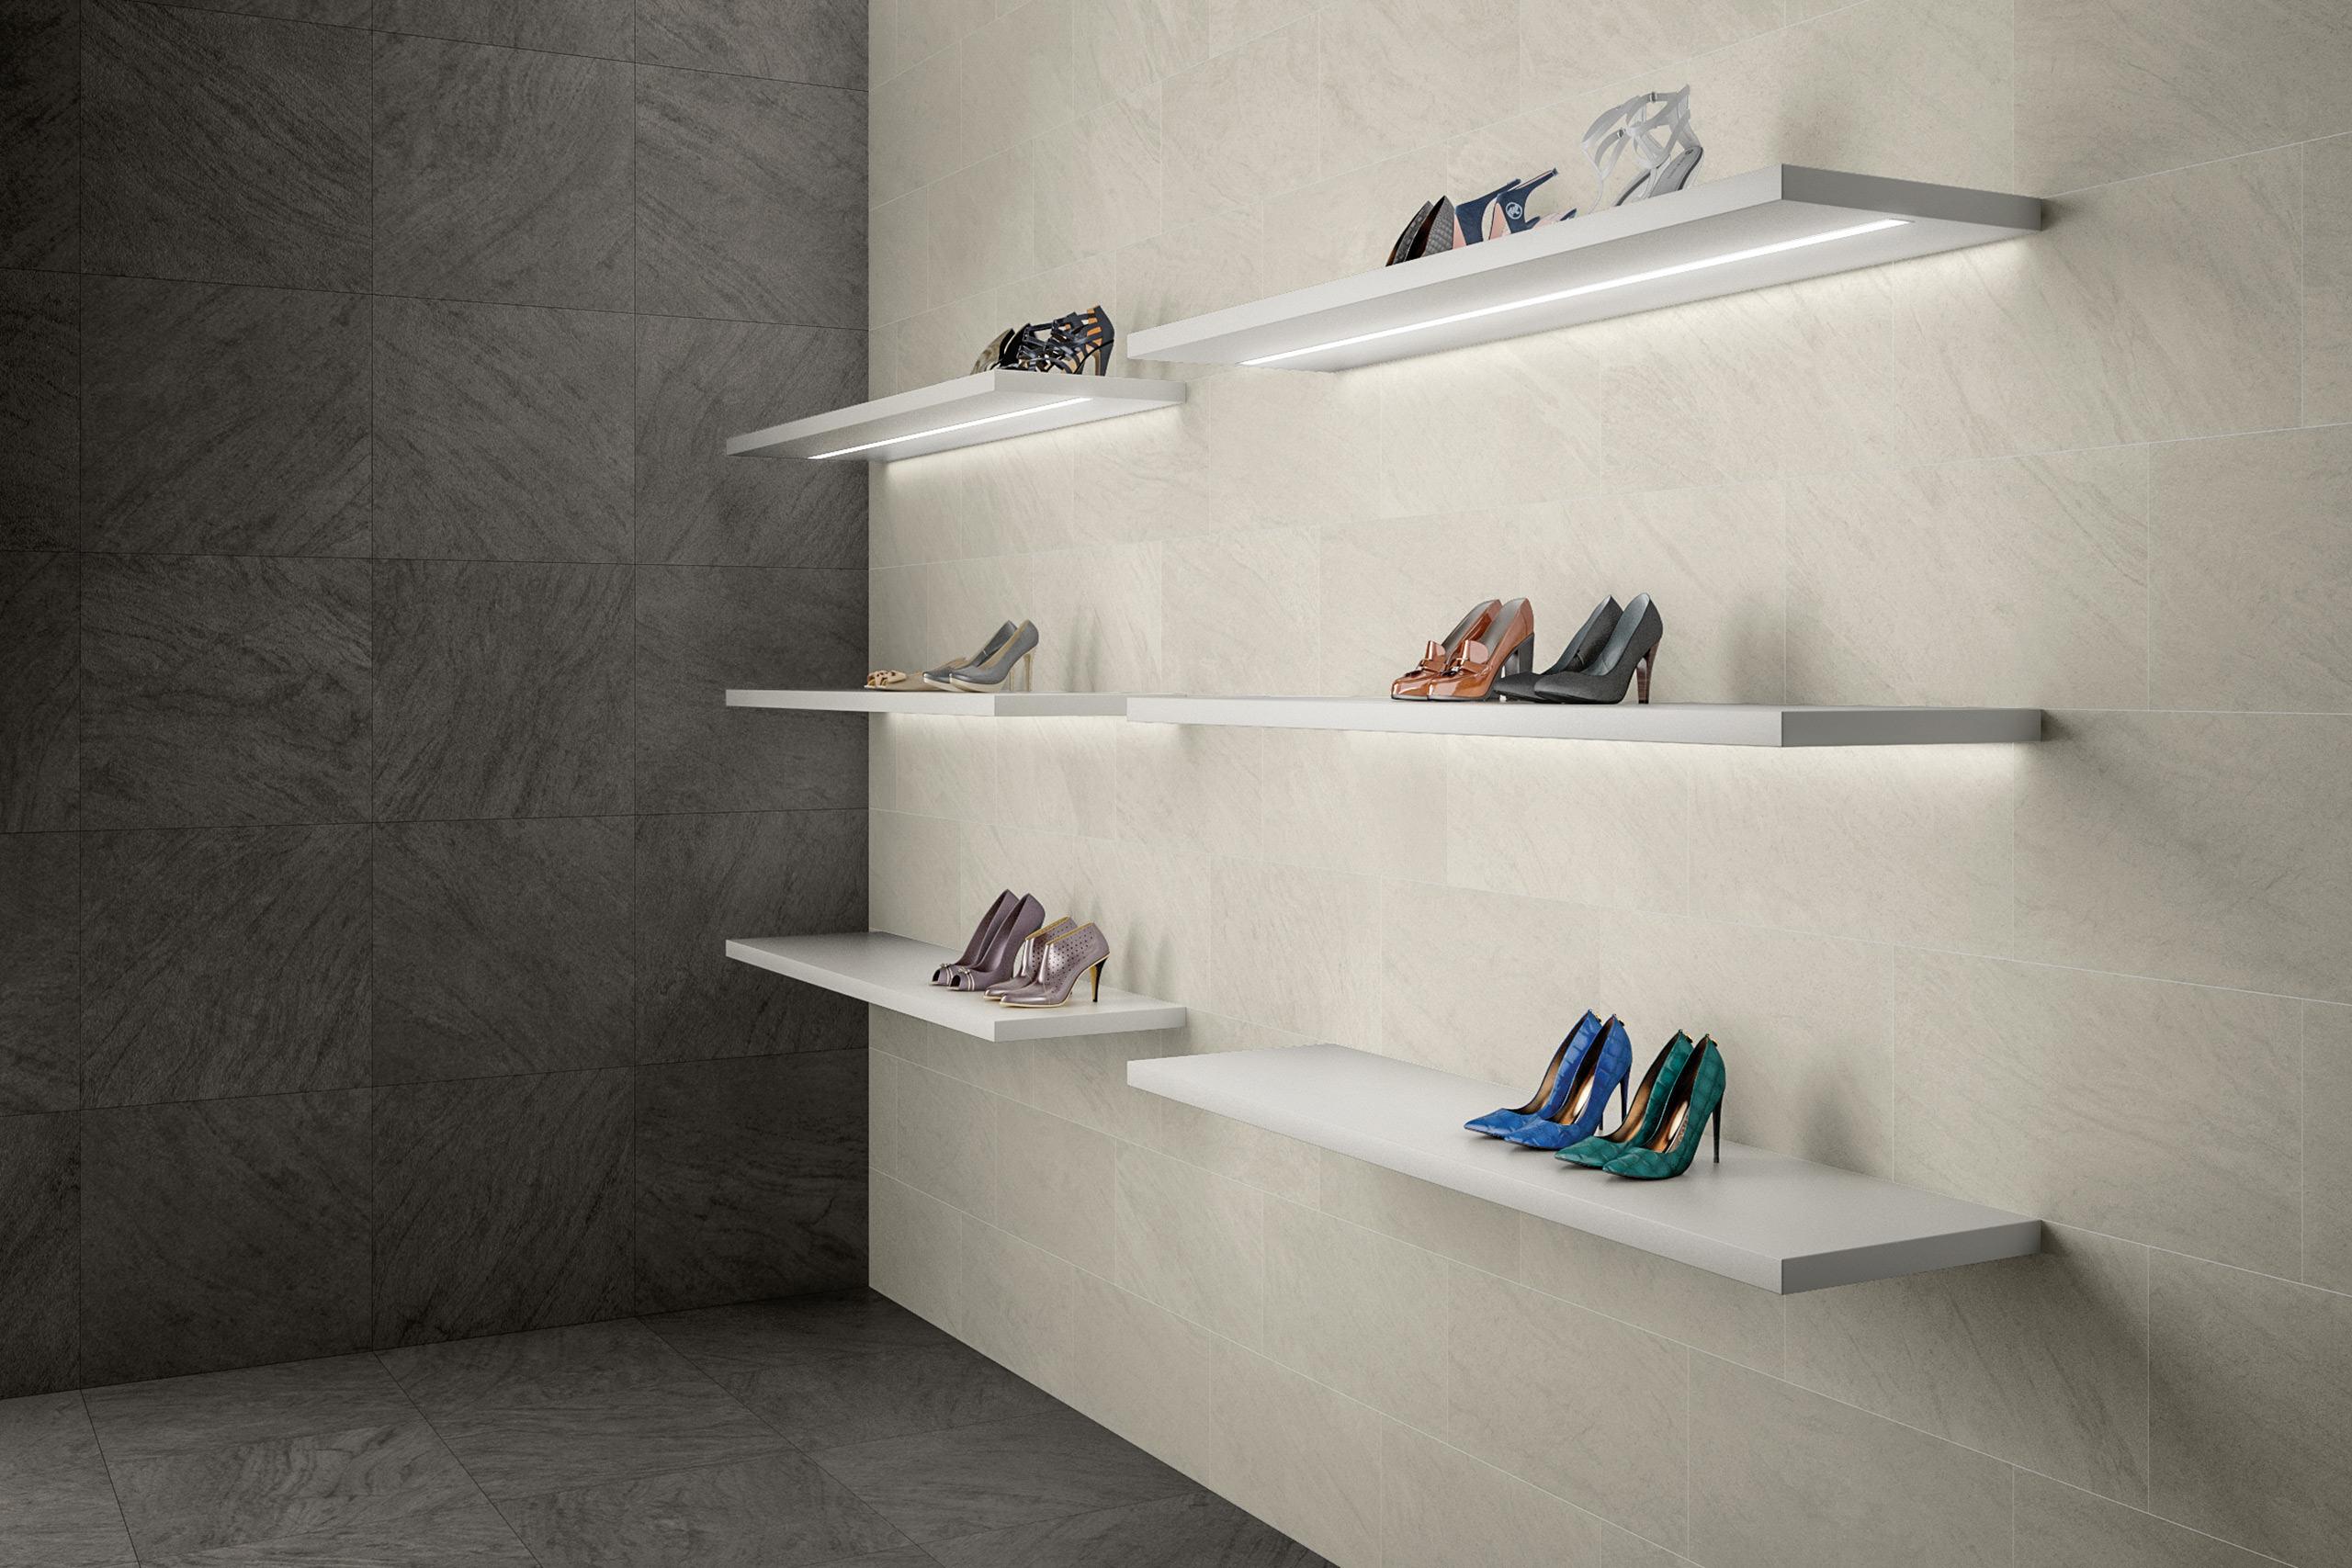 Rendering esterni interni fotorealistici Caesar negozio calzature 2